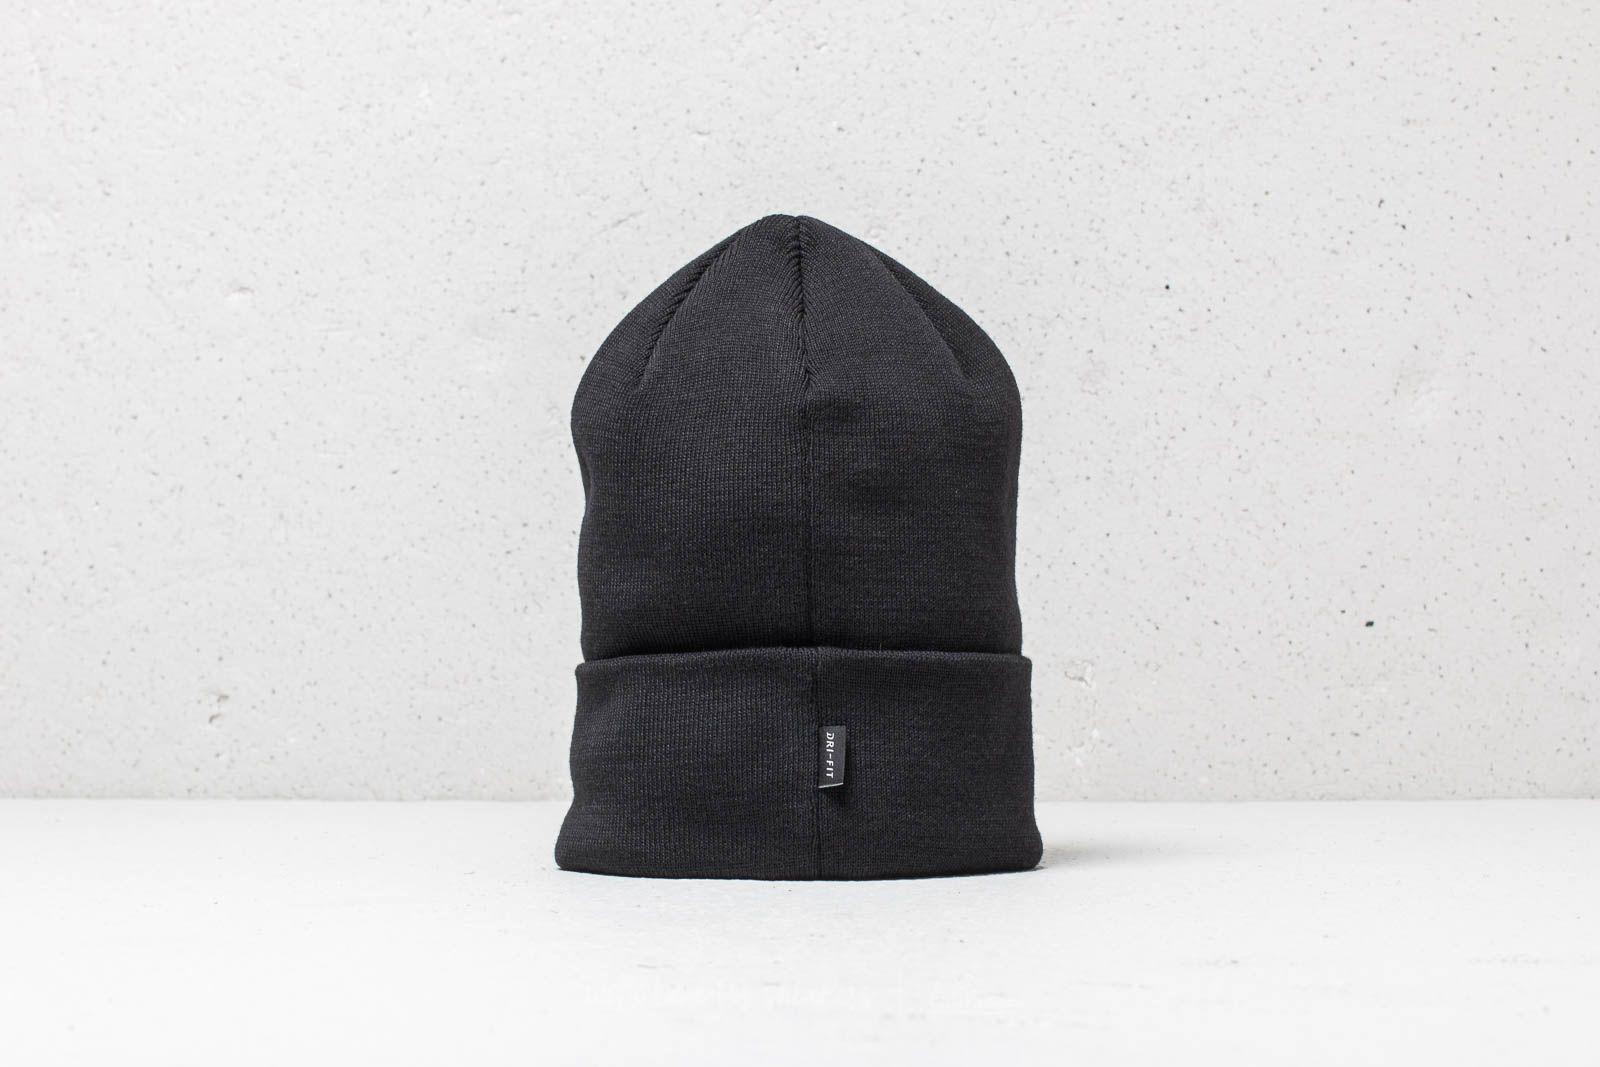 1ceb2dc33b6 Lyst - Nike Cuffed Beanie Black in Black for Men